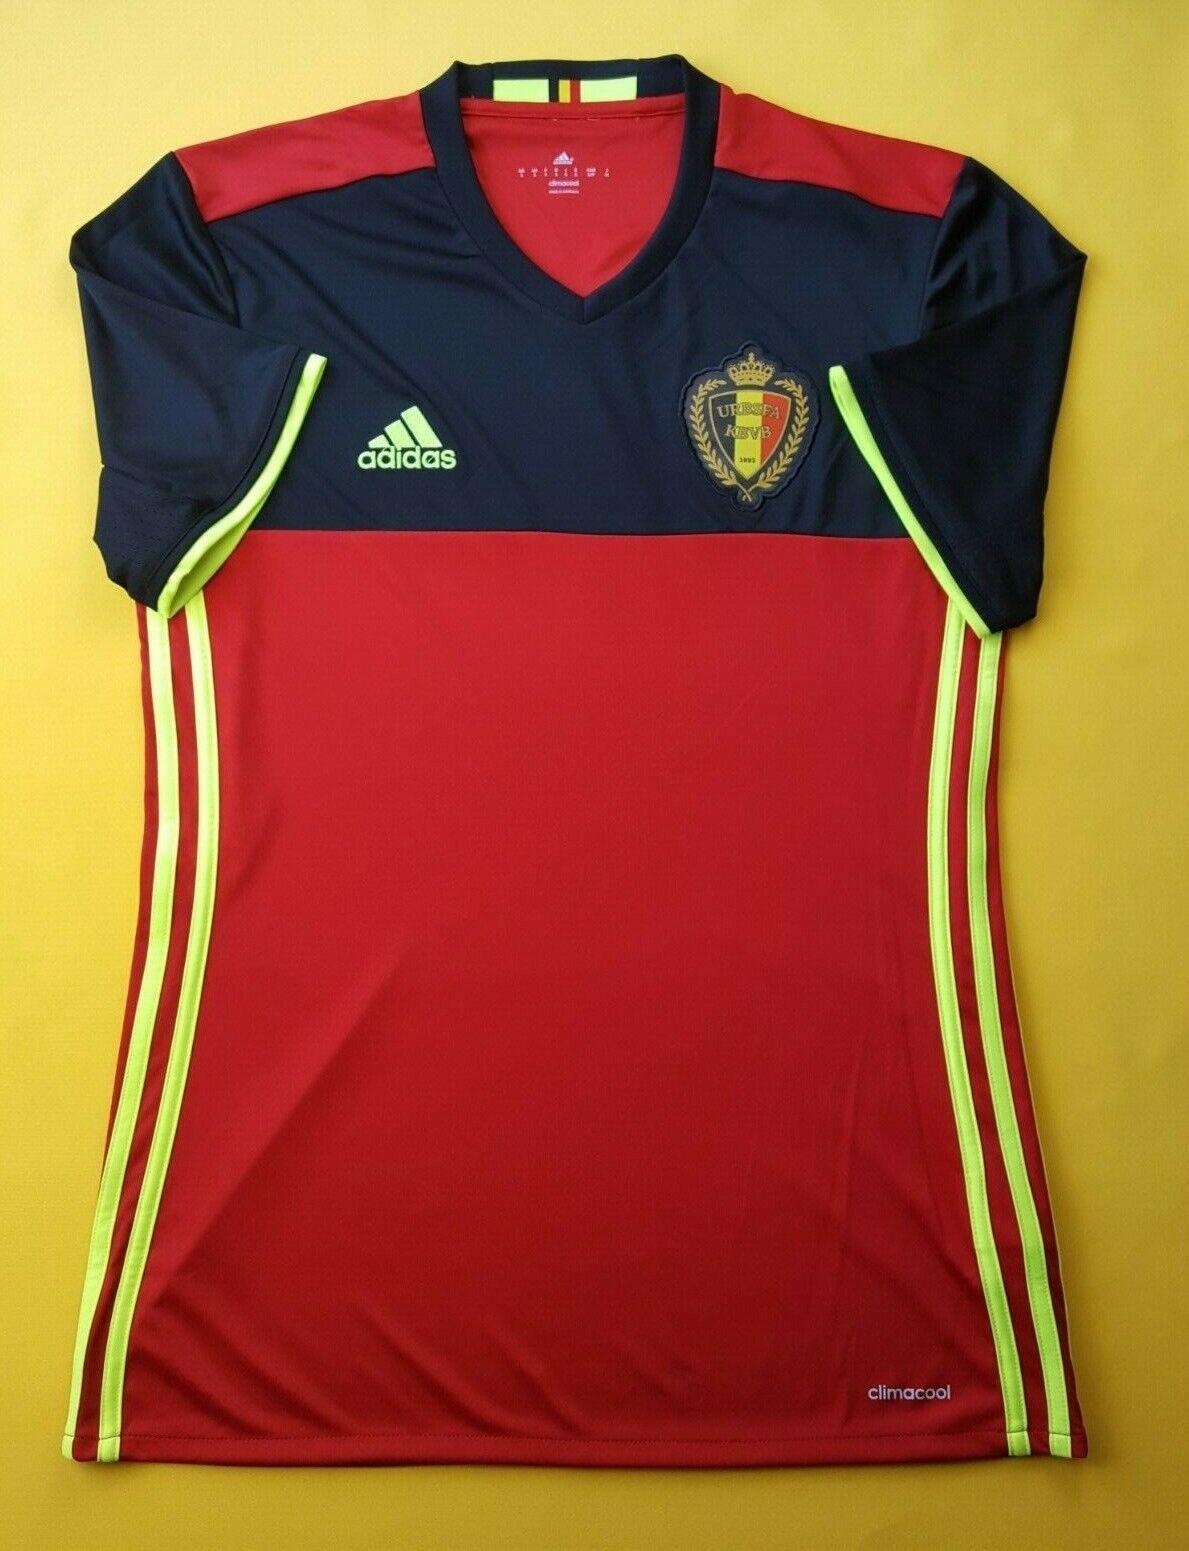 4.6 5 Belgium soccer jersey small 2016 home shirt AA8744 football Adidas ig93